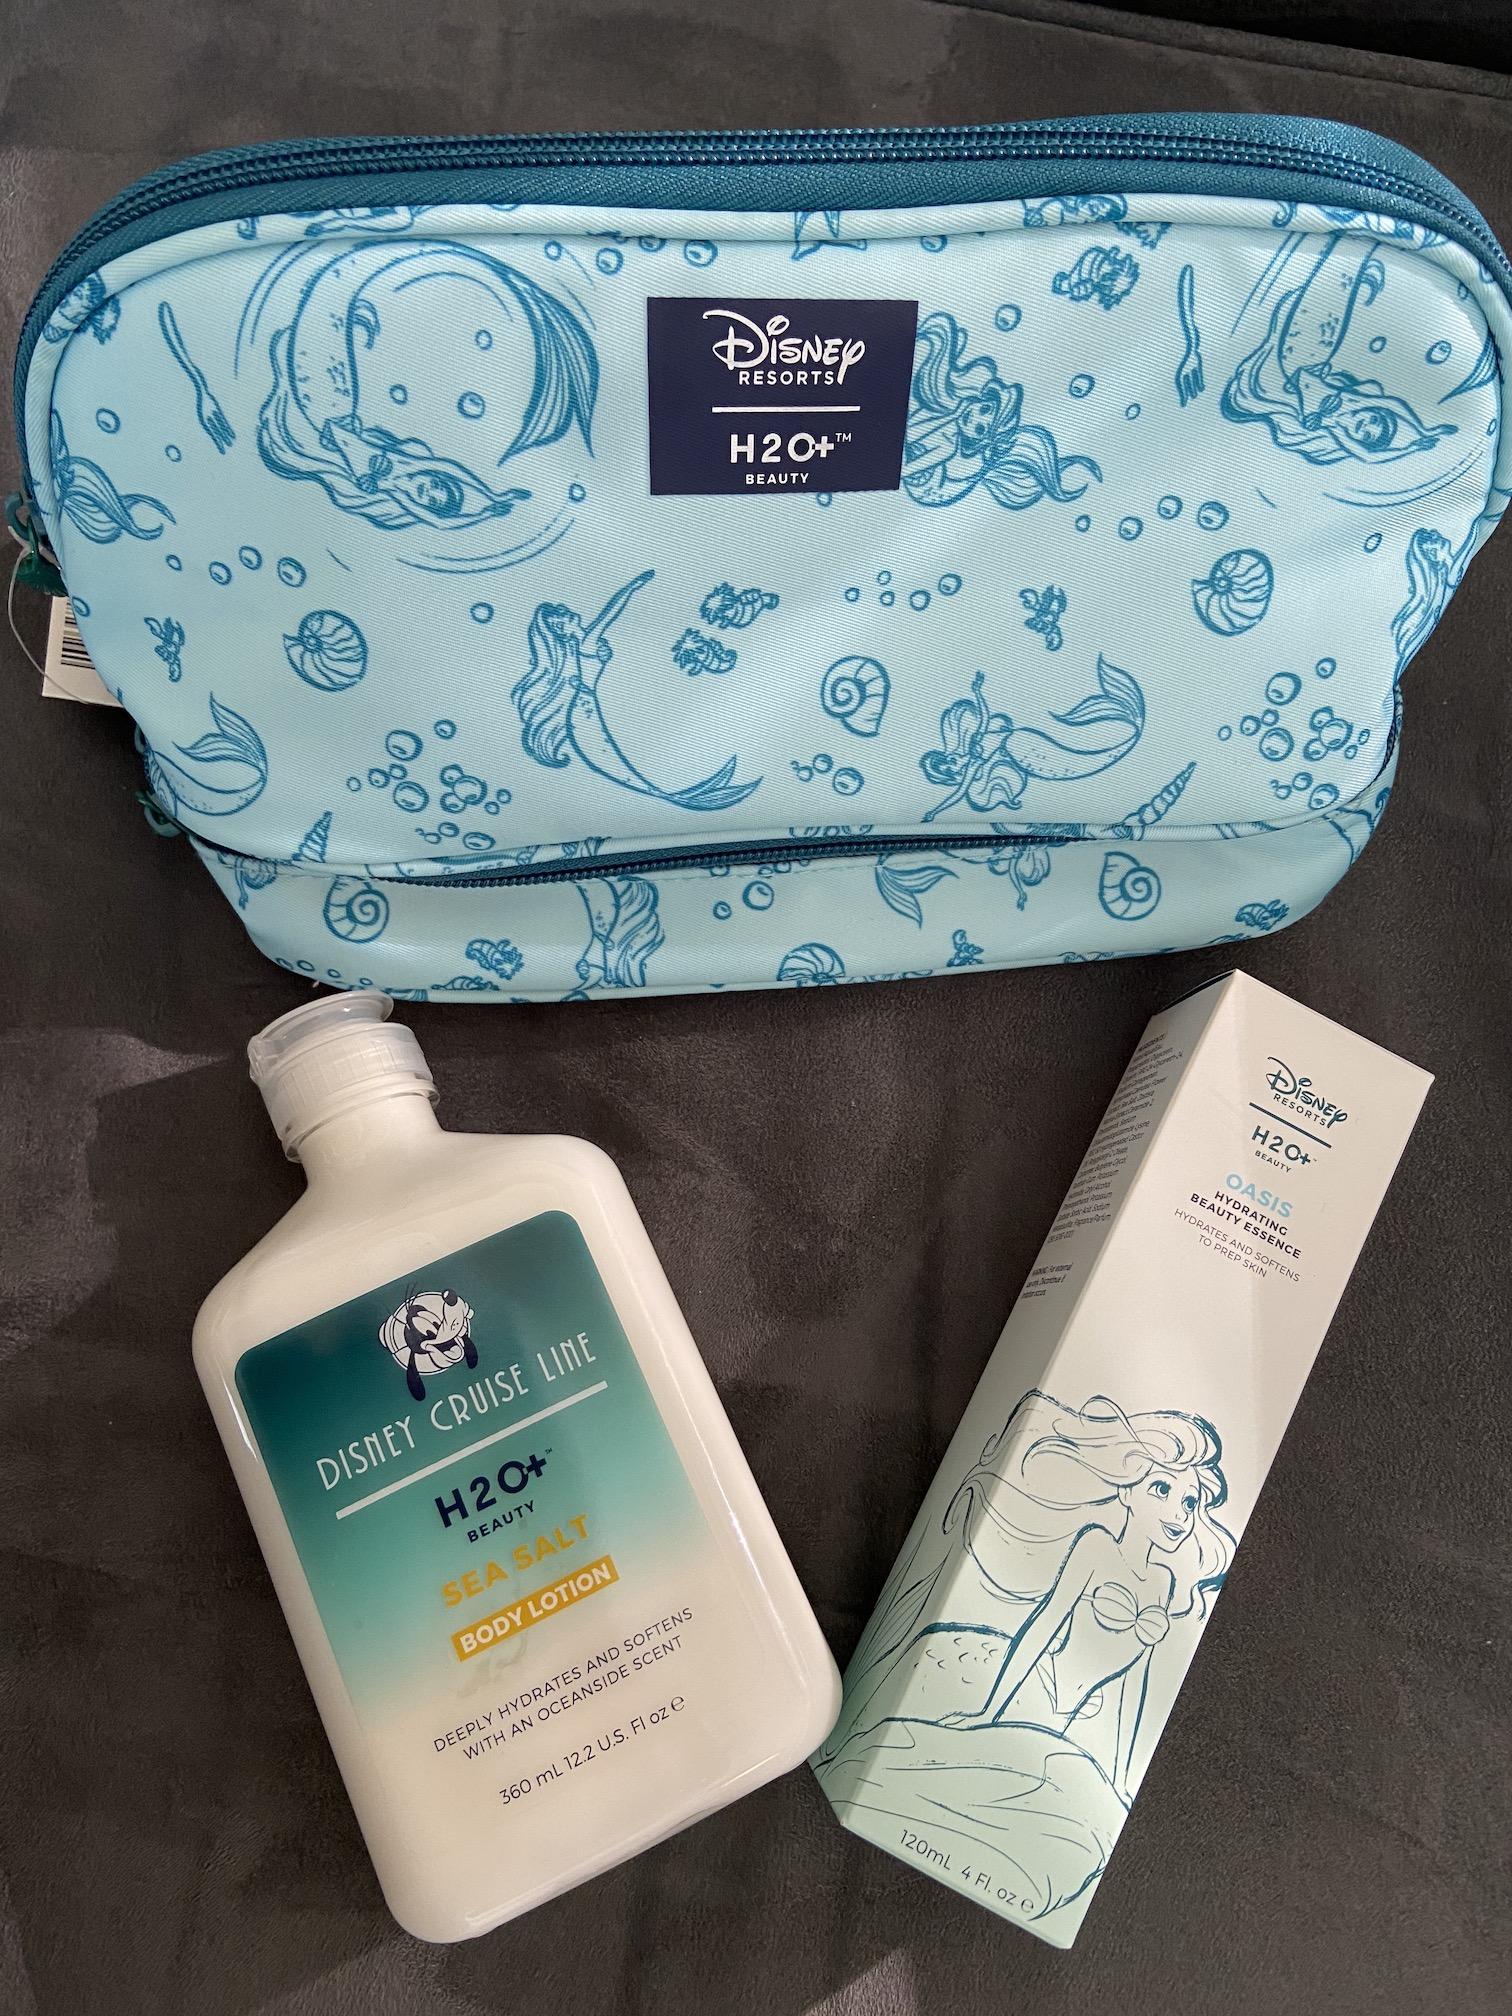 H2O Disney Beauty Items